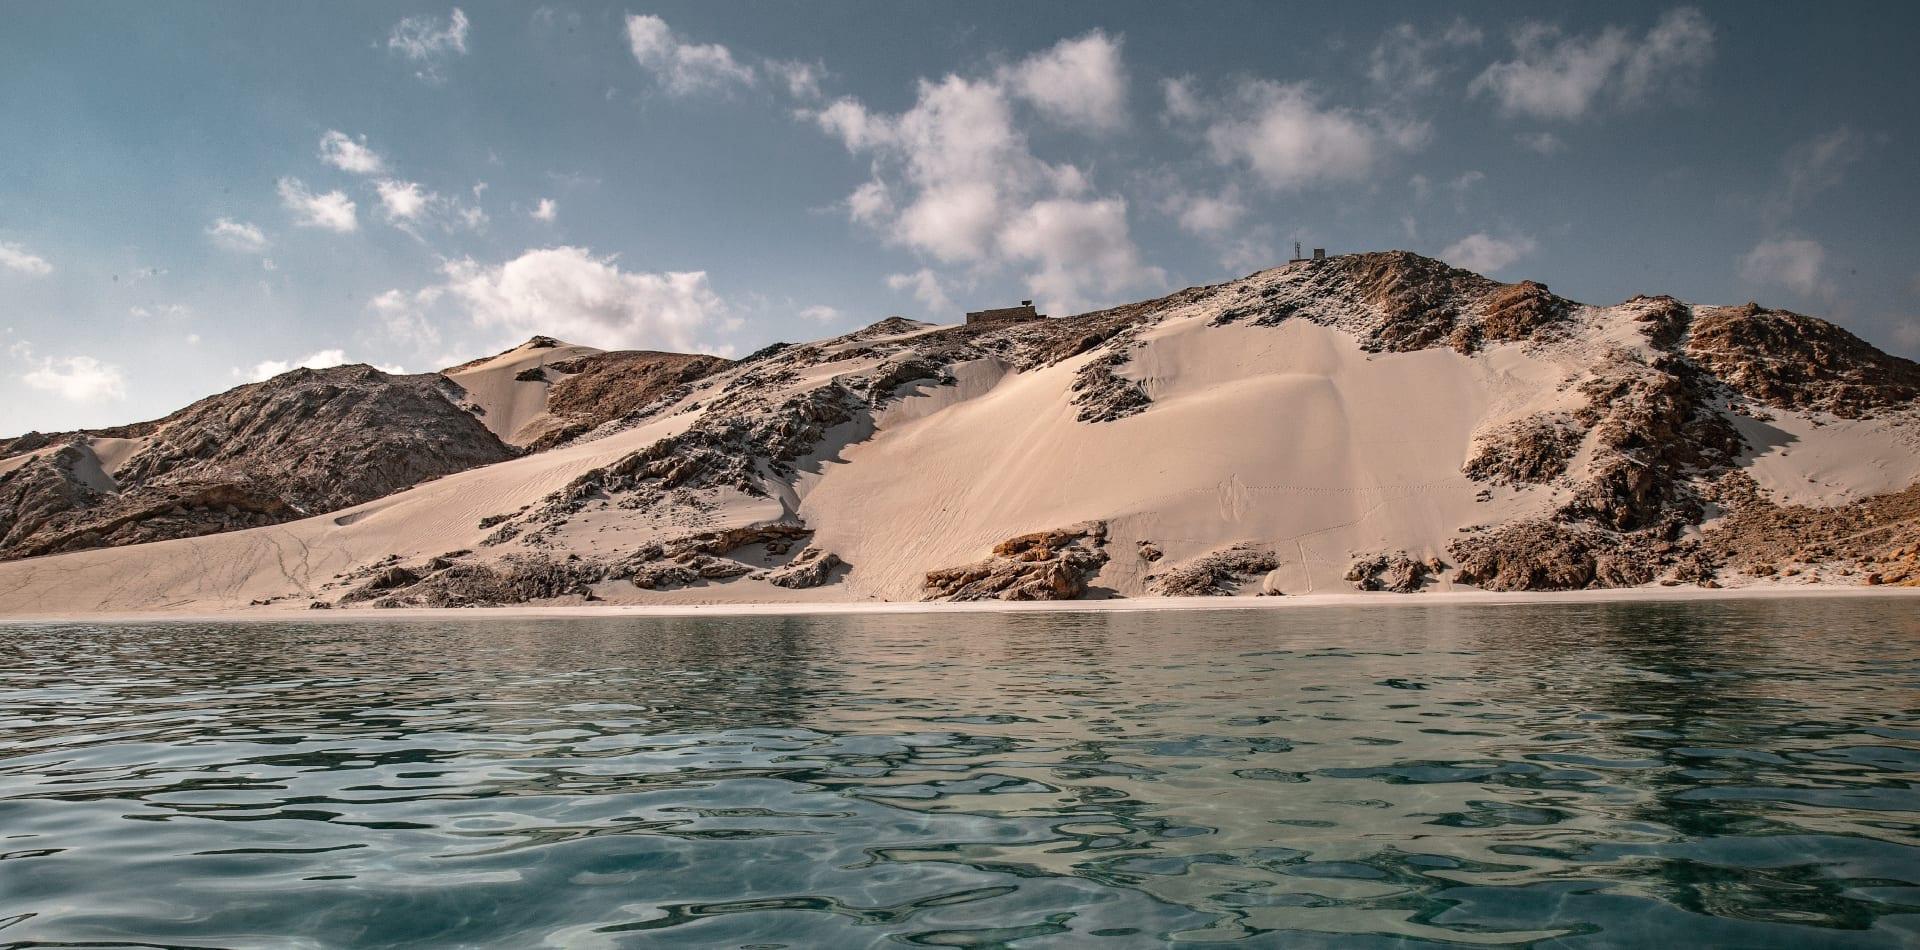 Socotra coastline in Yemen